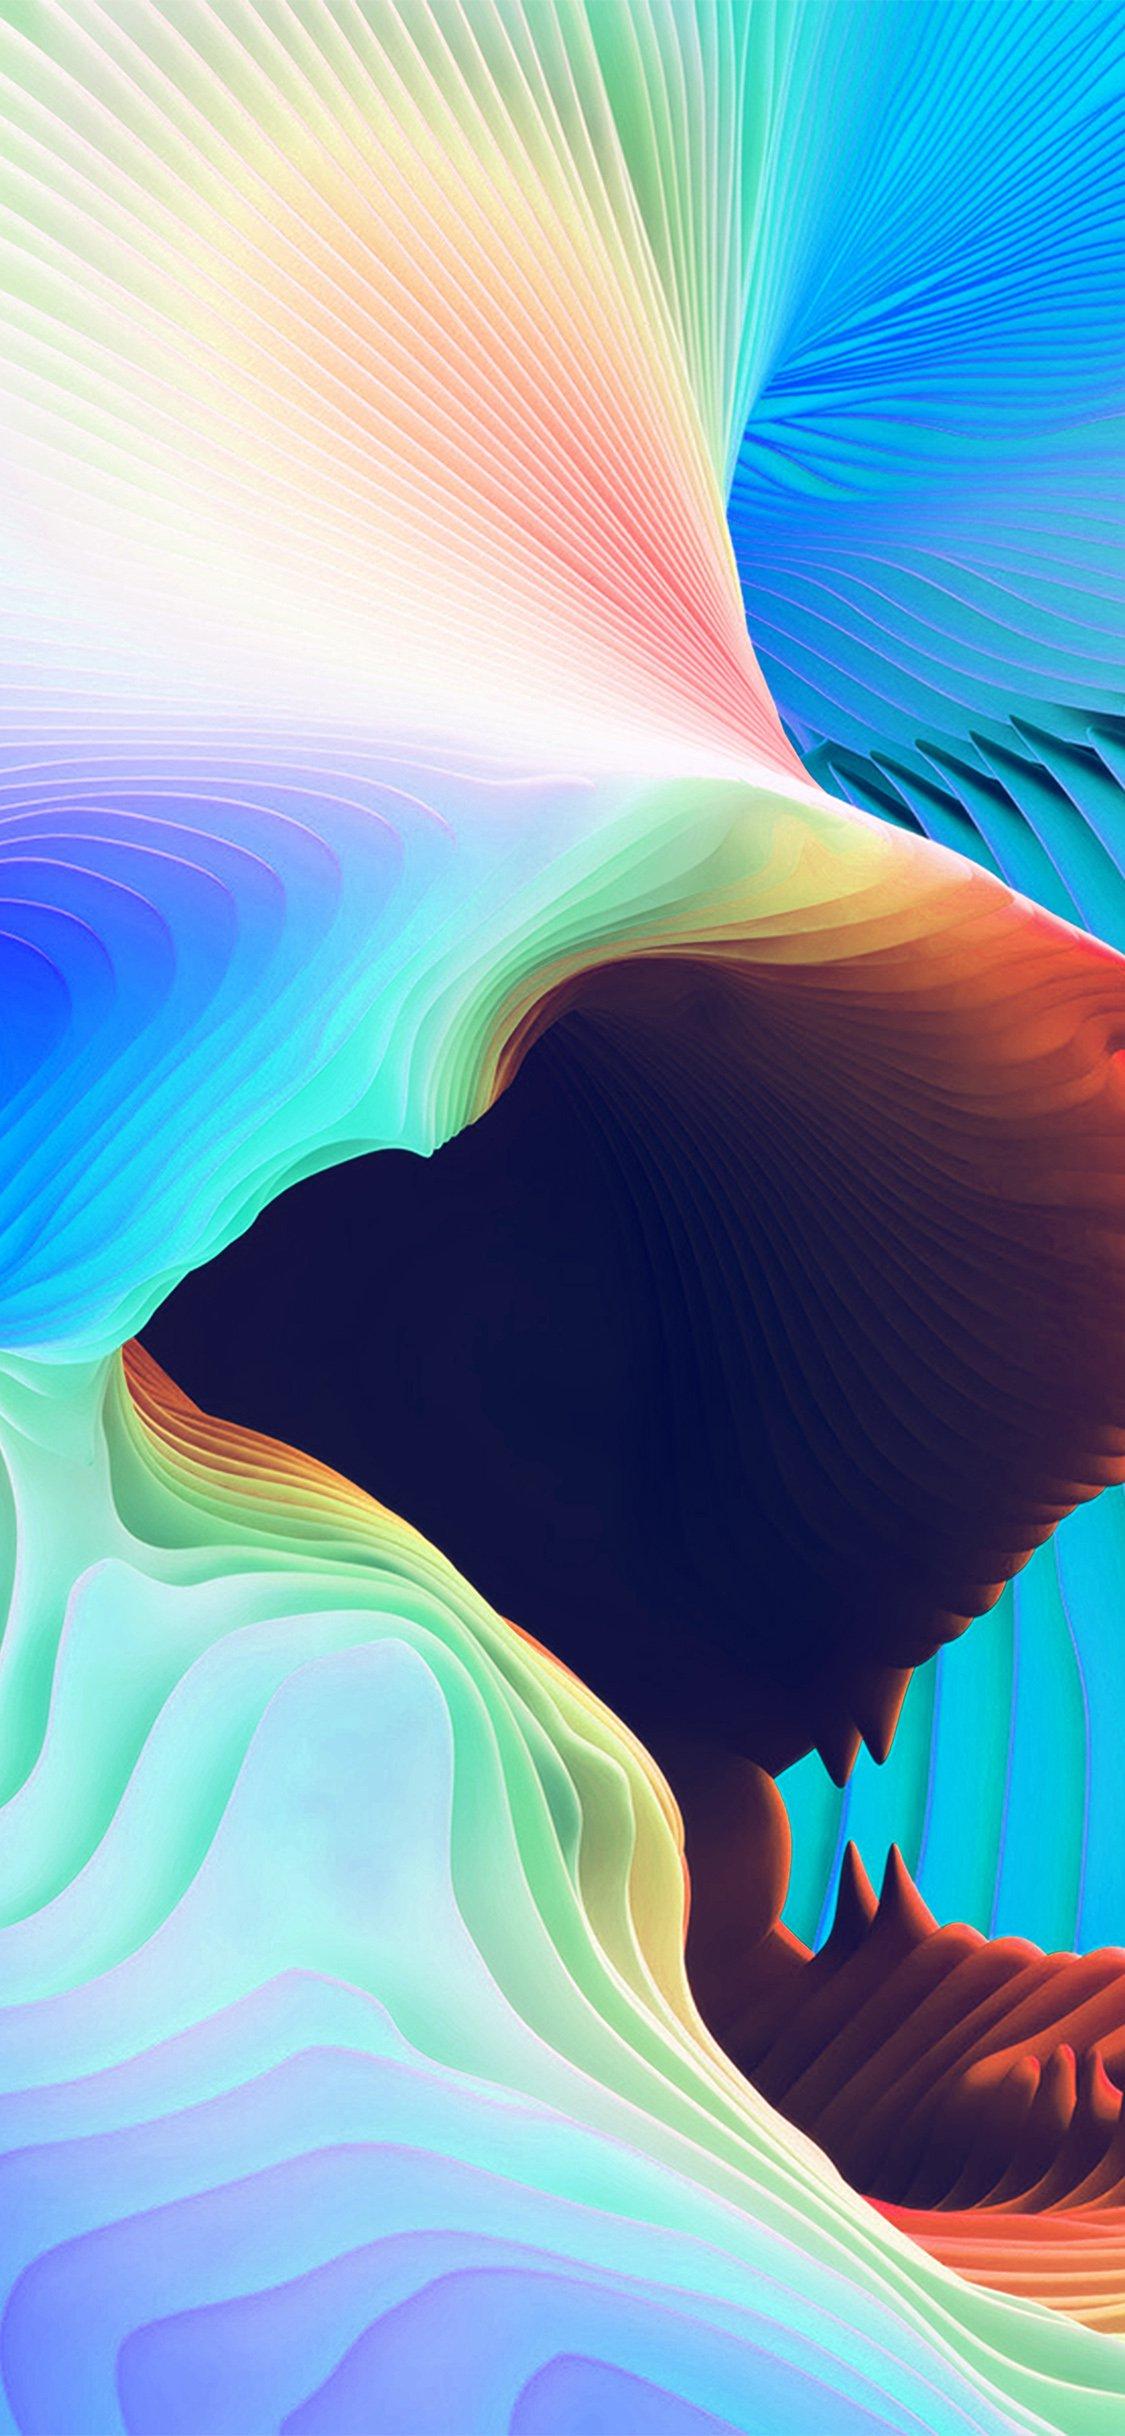 Curve art rainbow pattern iPhone X wallpaper